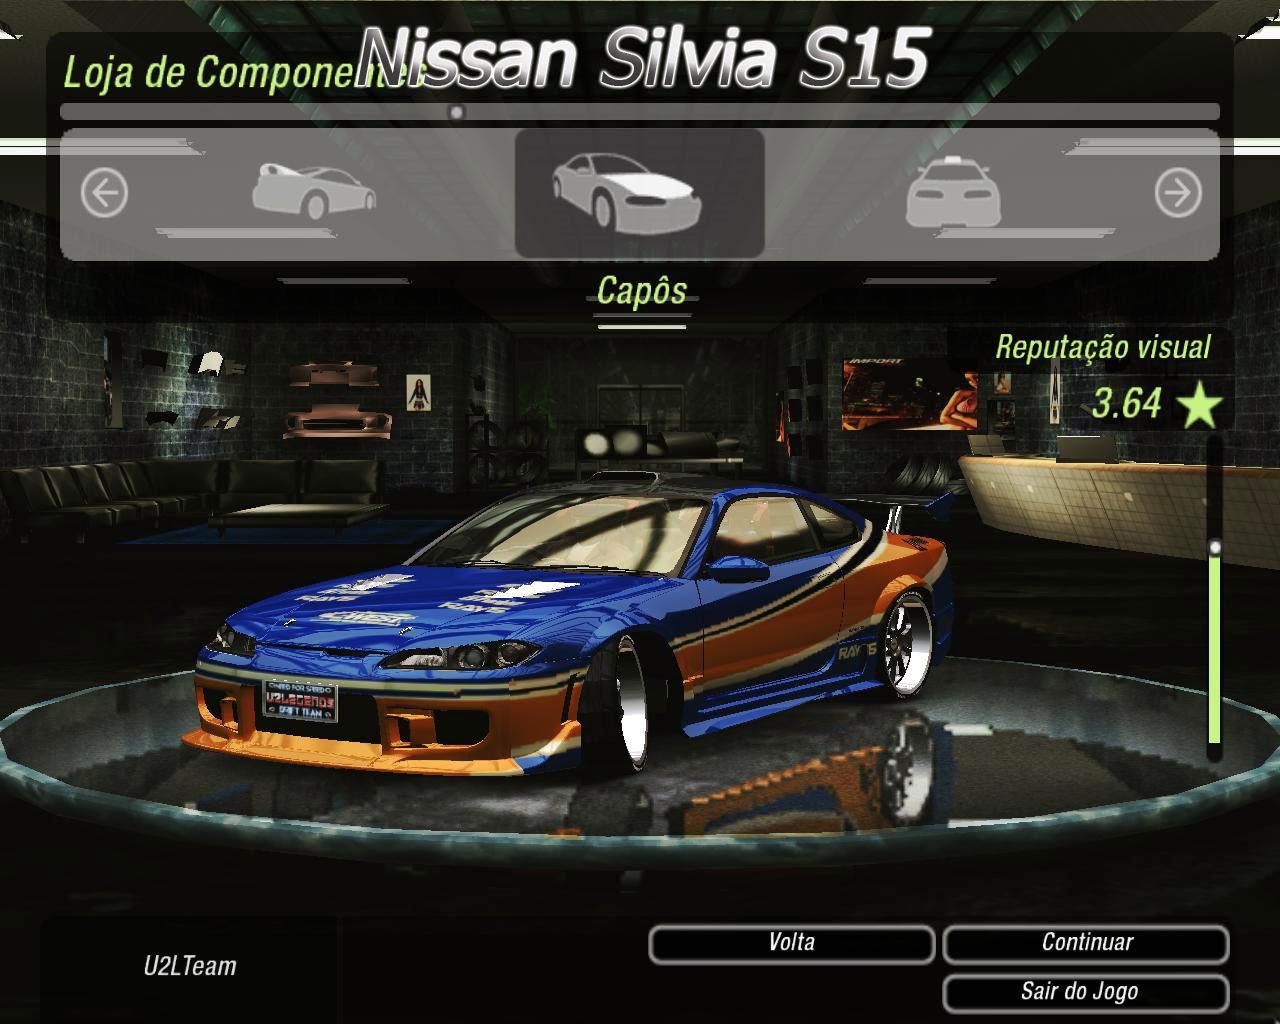 Vinyl Nissan Silvia S15 Velozes E Furiosos Desafio Em Toquio Mona Lisa Monaliza